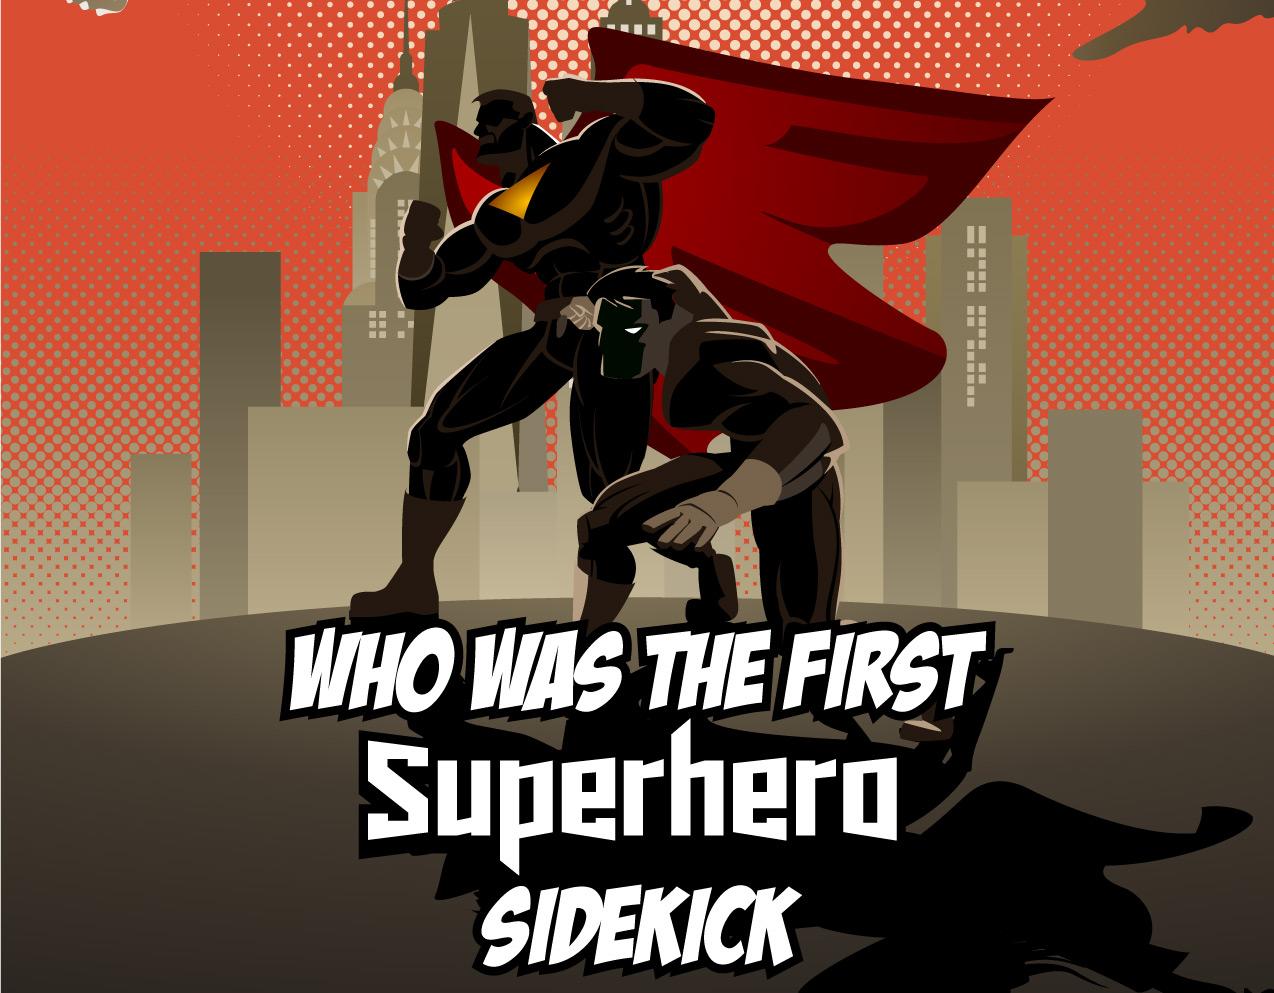 who-is-the-first-superhero-sidekick